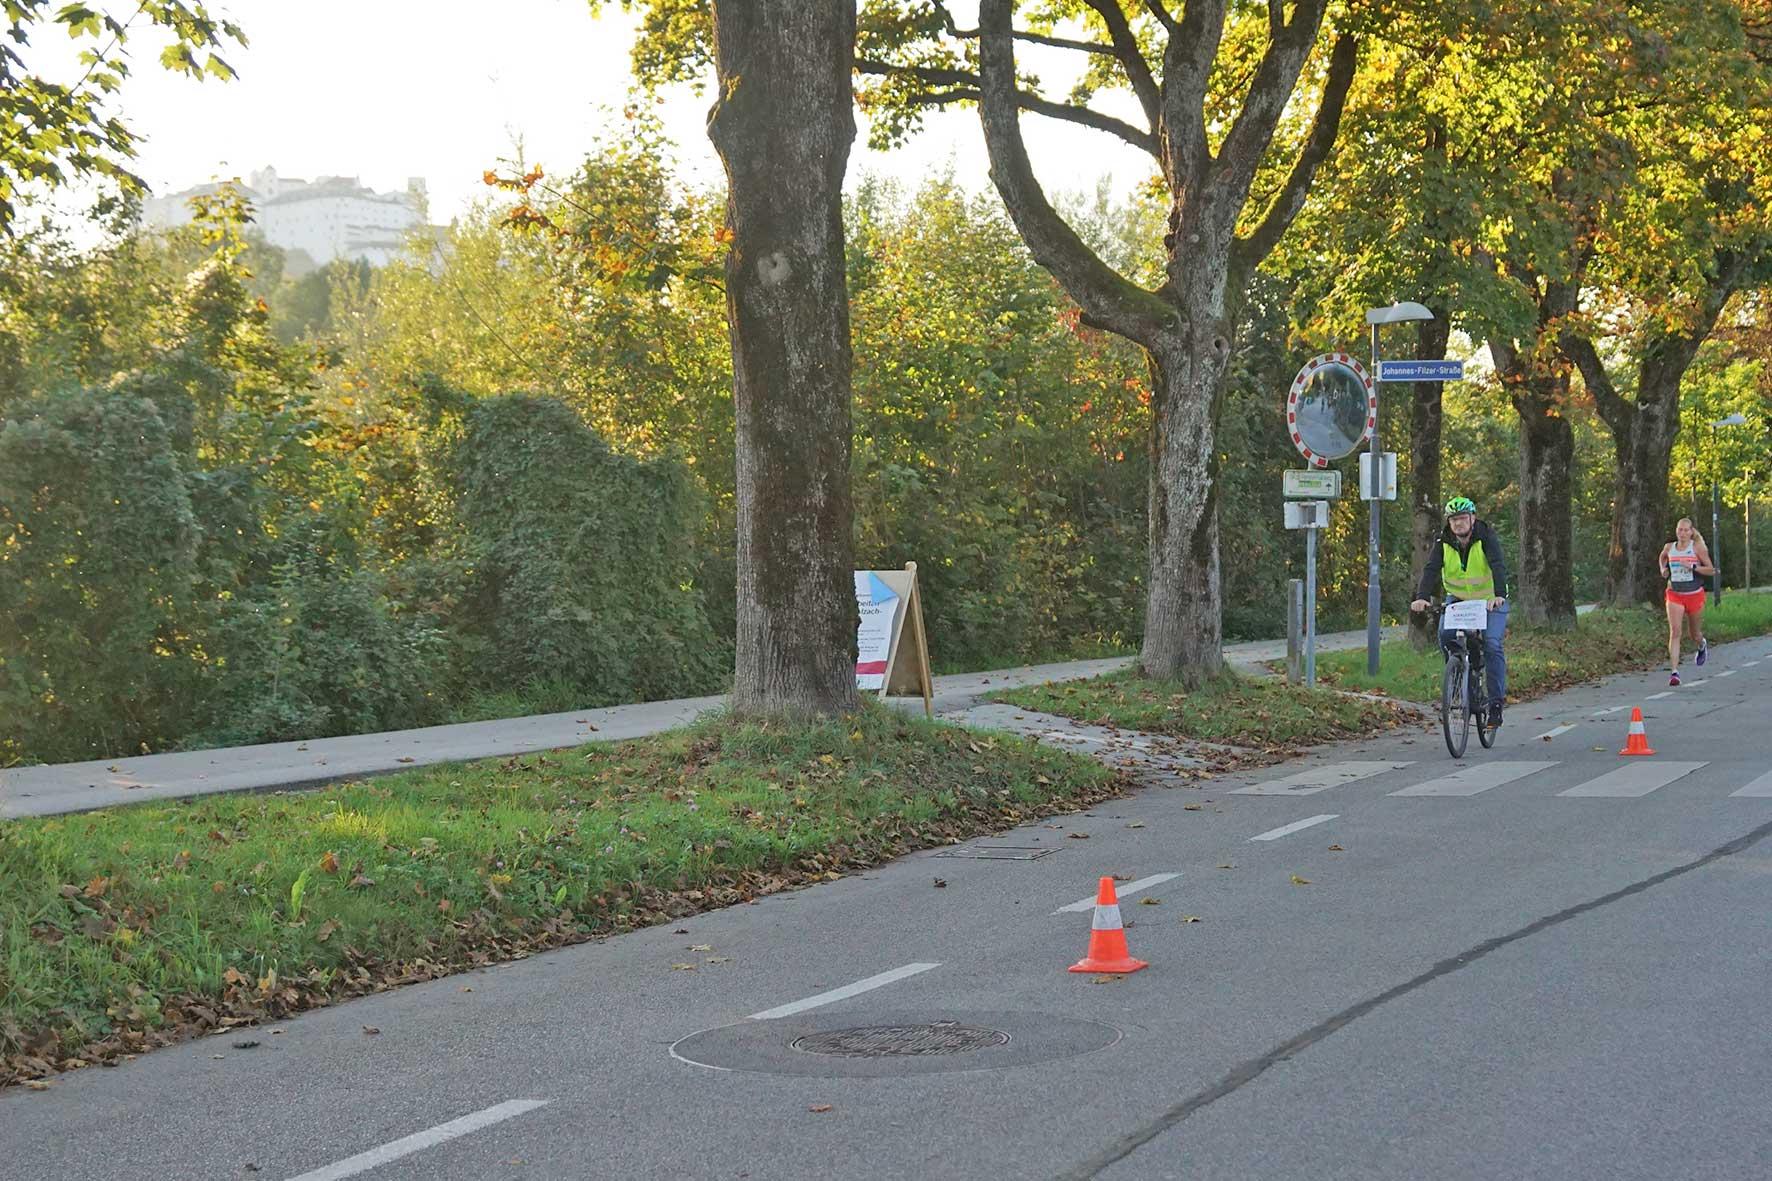 Salzburg-Cityguide - Foto - 211001_Sbg_Frauenlauf_LSF_2021_K_000